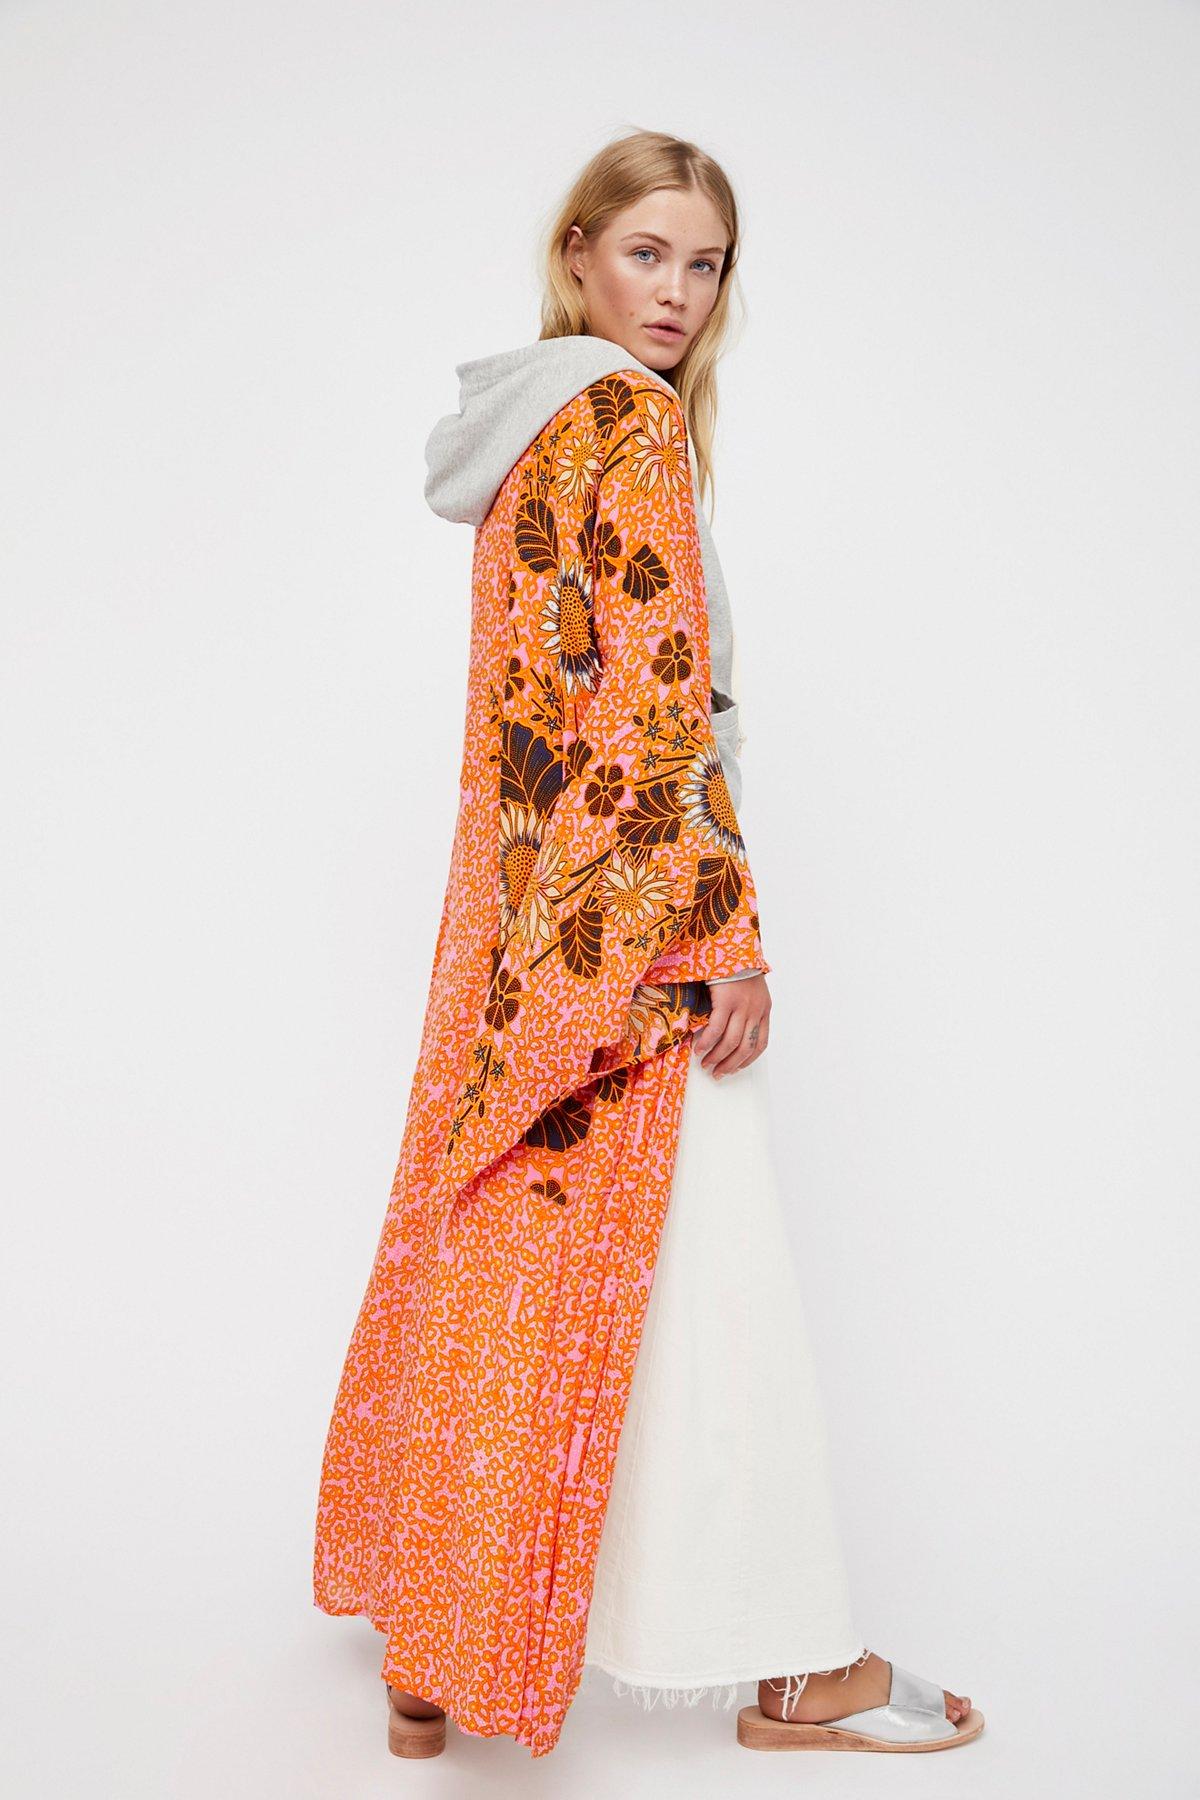 FP One Borneo Kimono